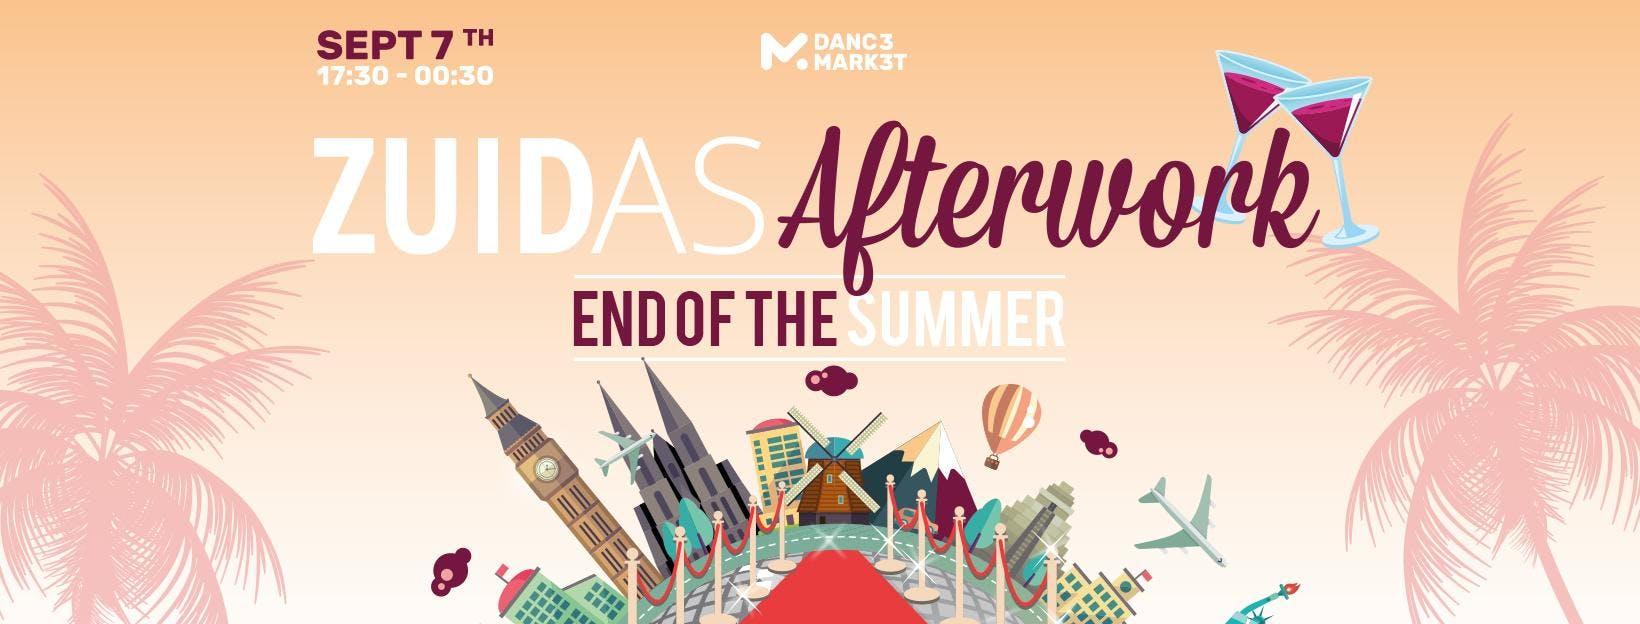 DanceMarket - End Of The Summer - September 7